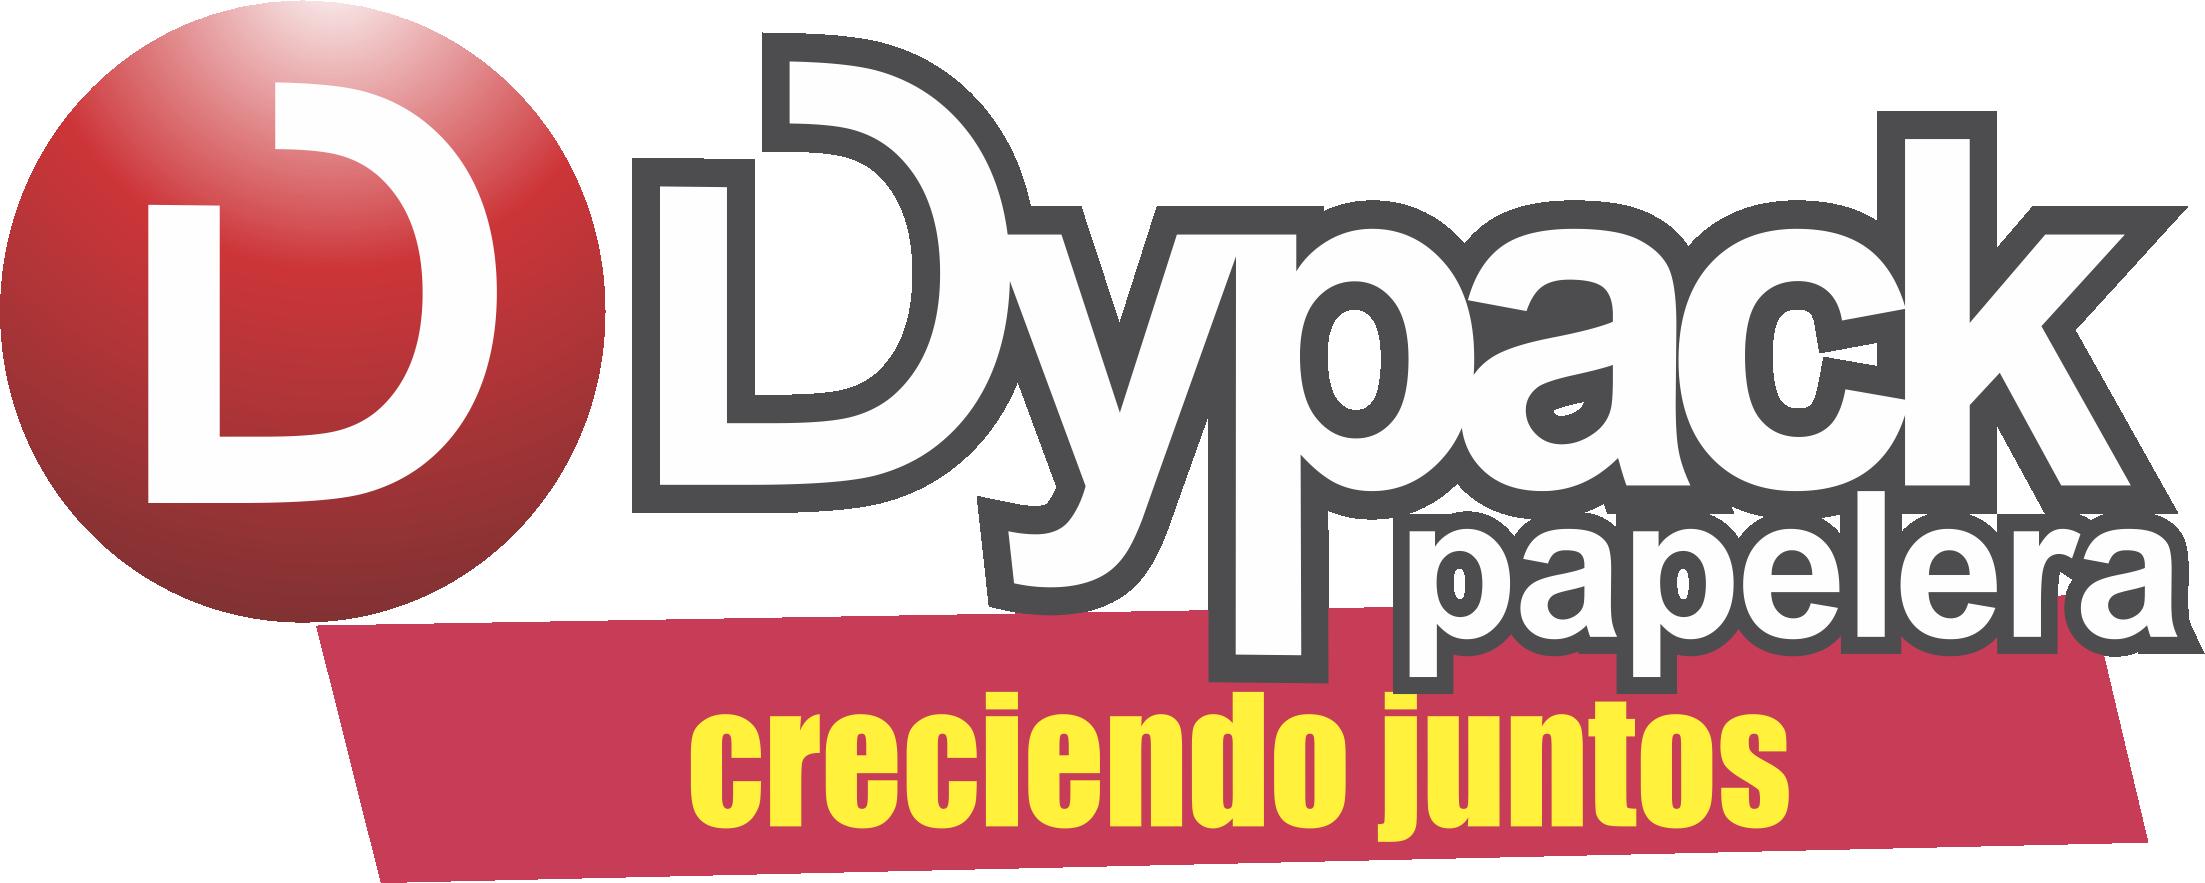 Dypack Papelera